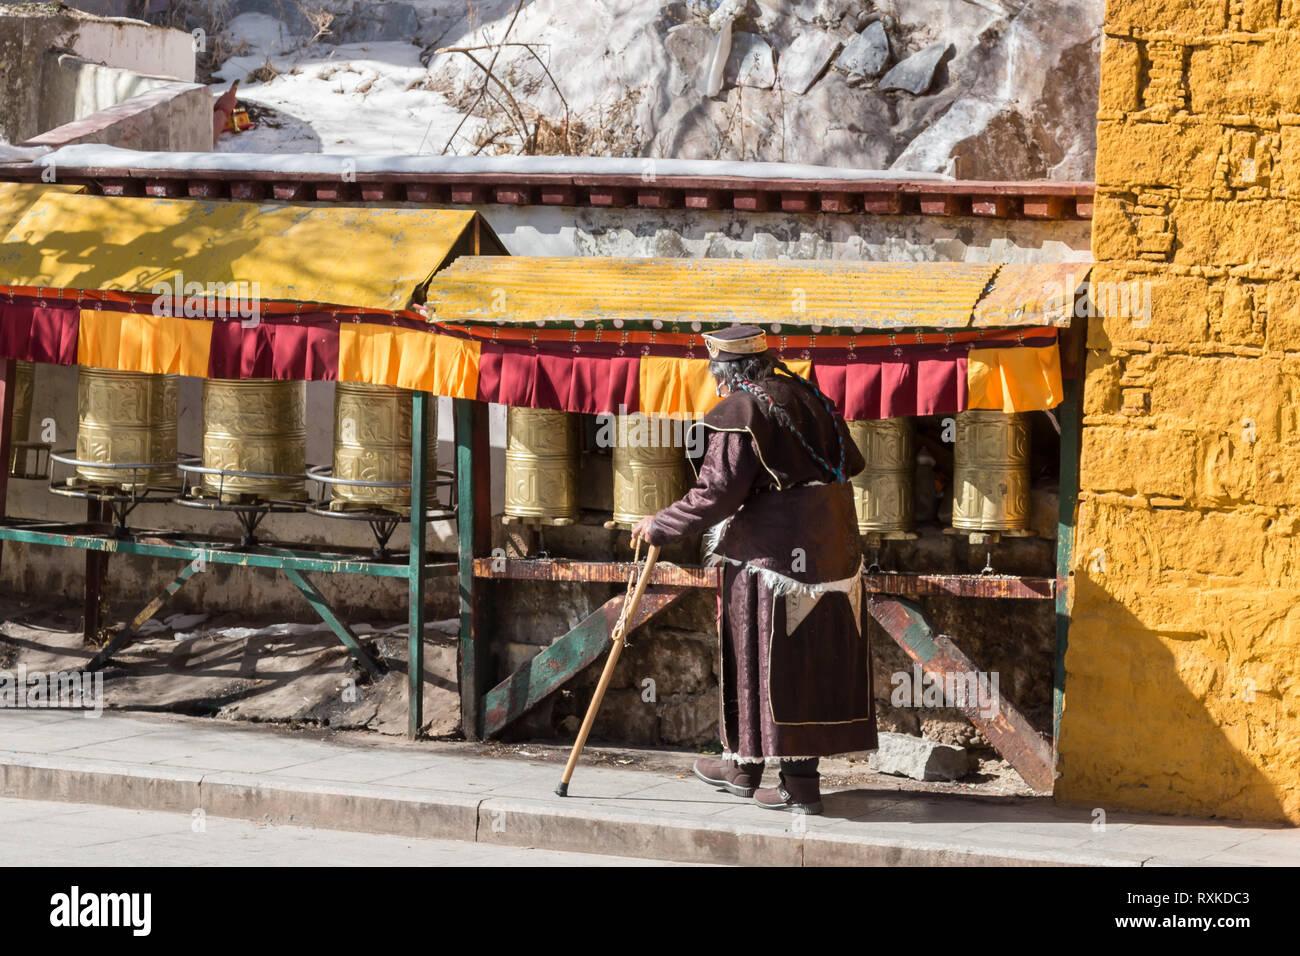 An old Buddhist man worshiping by spinning prayer wheels at Potala Palace, Lhasa, Tibet. - Stock Image